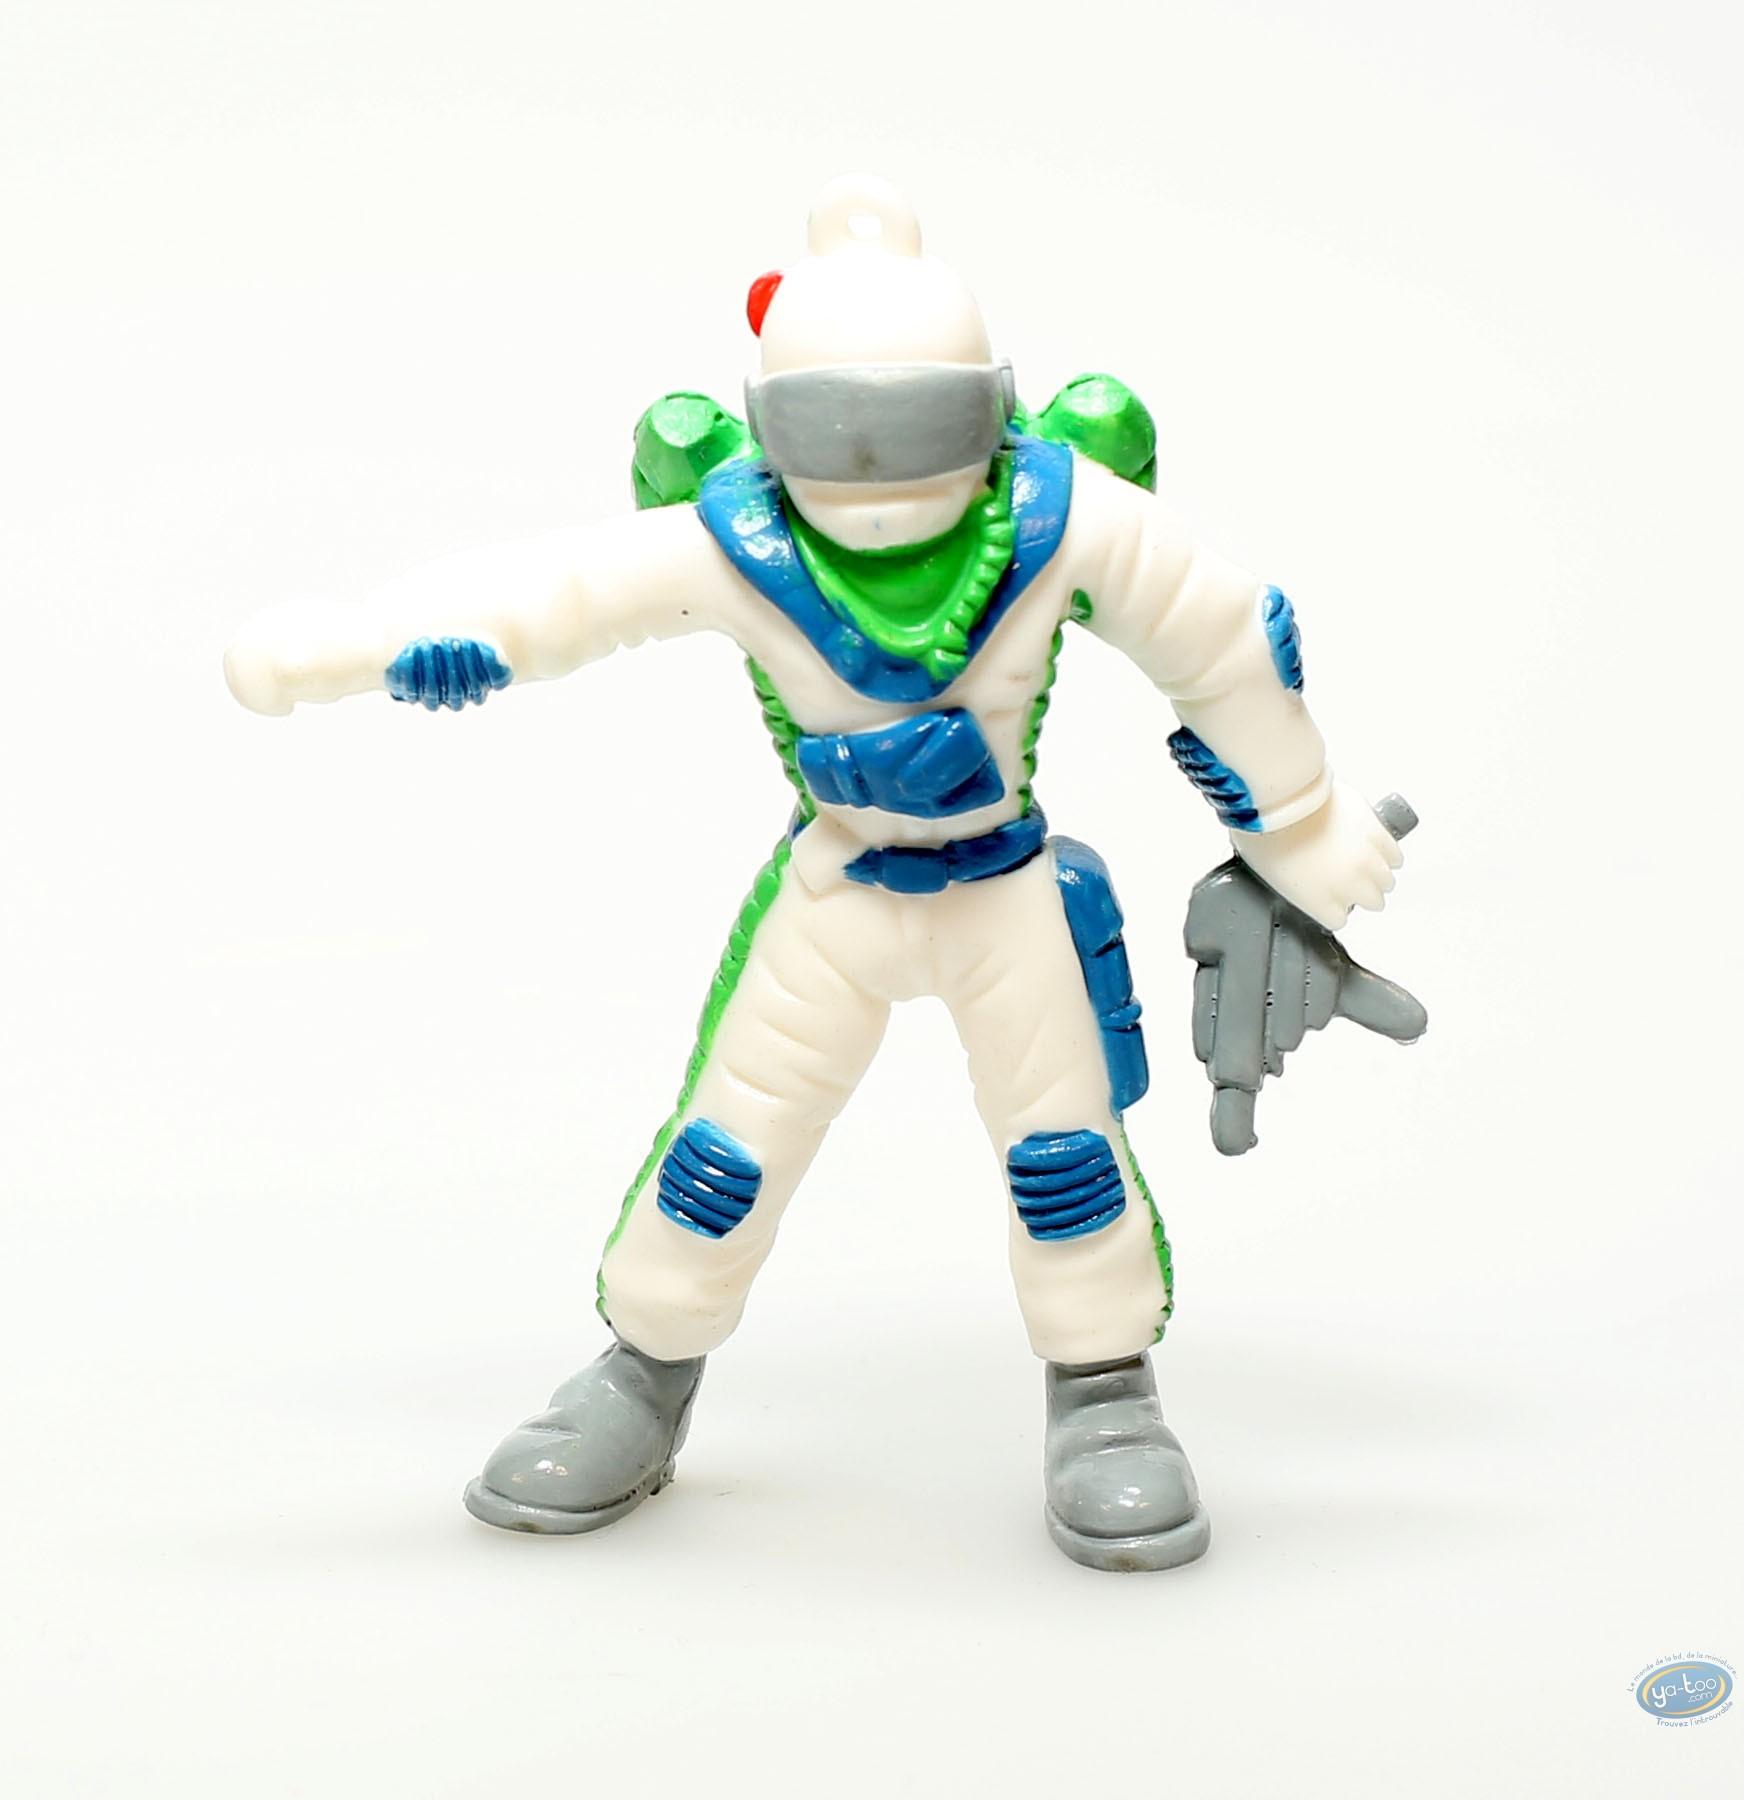 Plastic Figurine, Plastic figure, White figure with grey gun